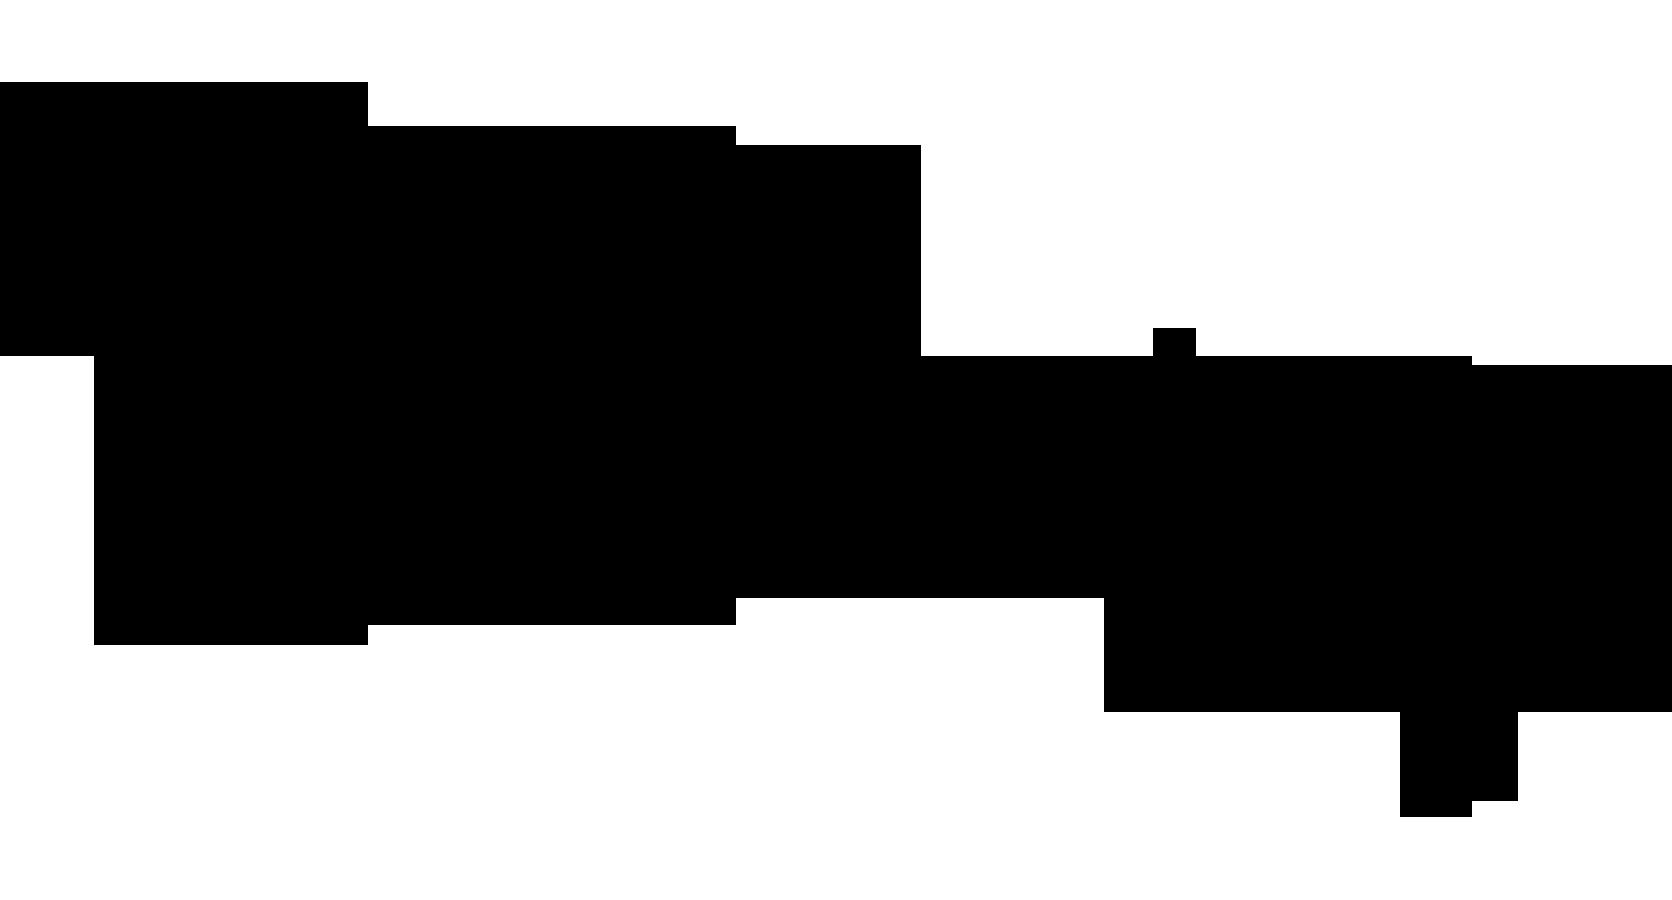 https://d2u59yiom87c24.cloudfront.net/background/Disney-Logo.png?mtime=20190817093308